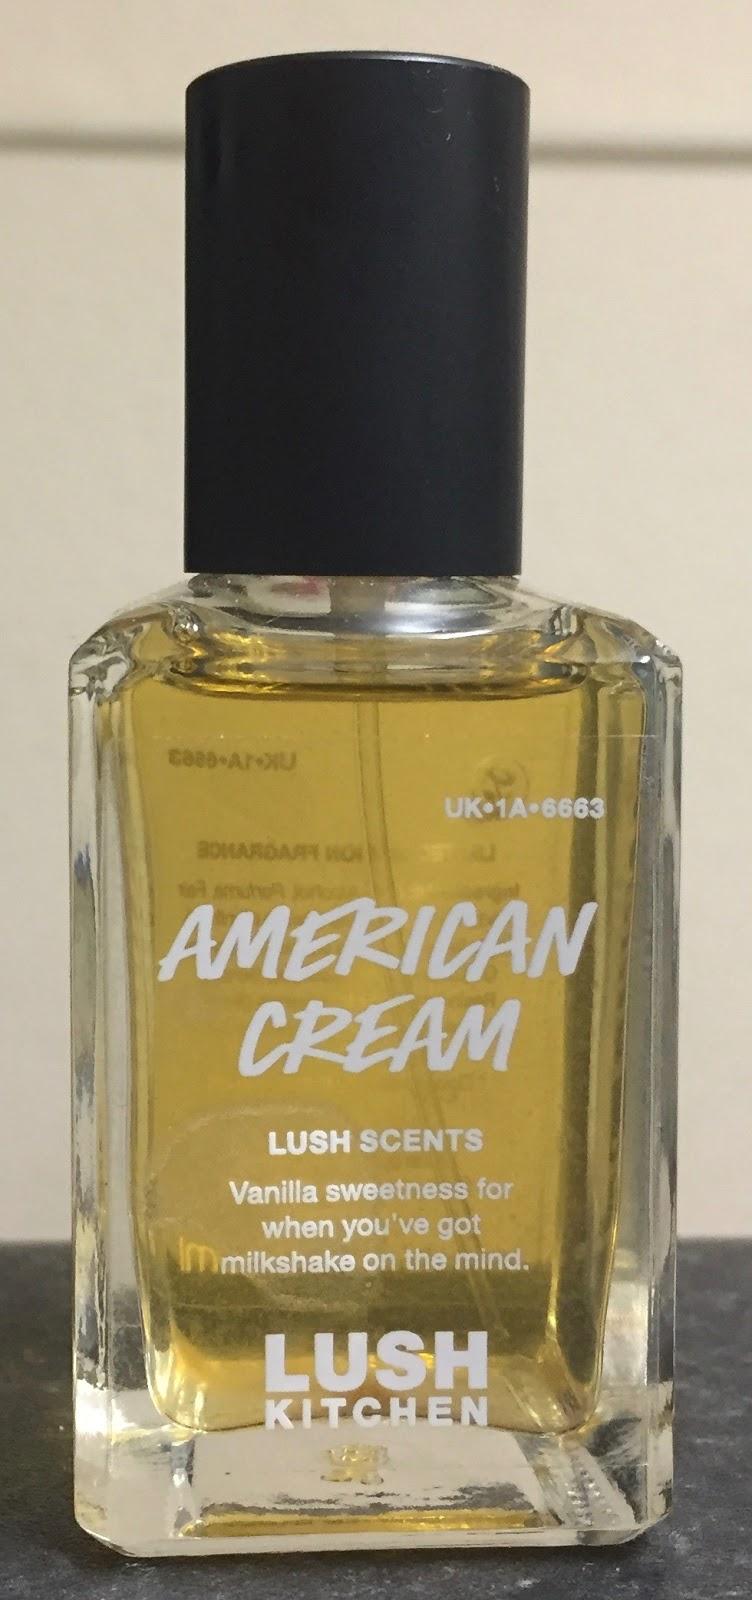 All Things Lush UK: American Cream Liquid Perfume